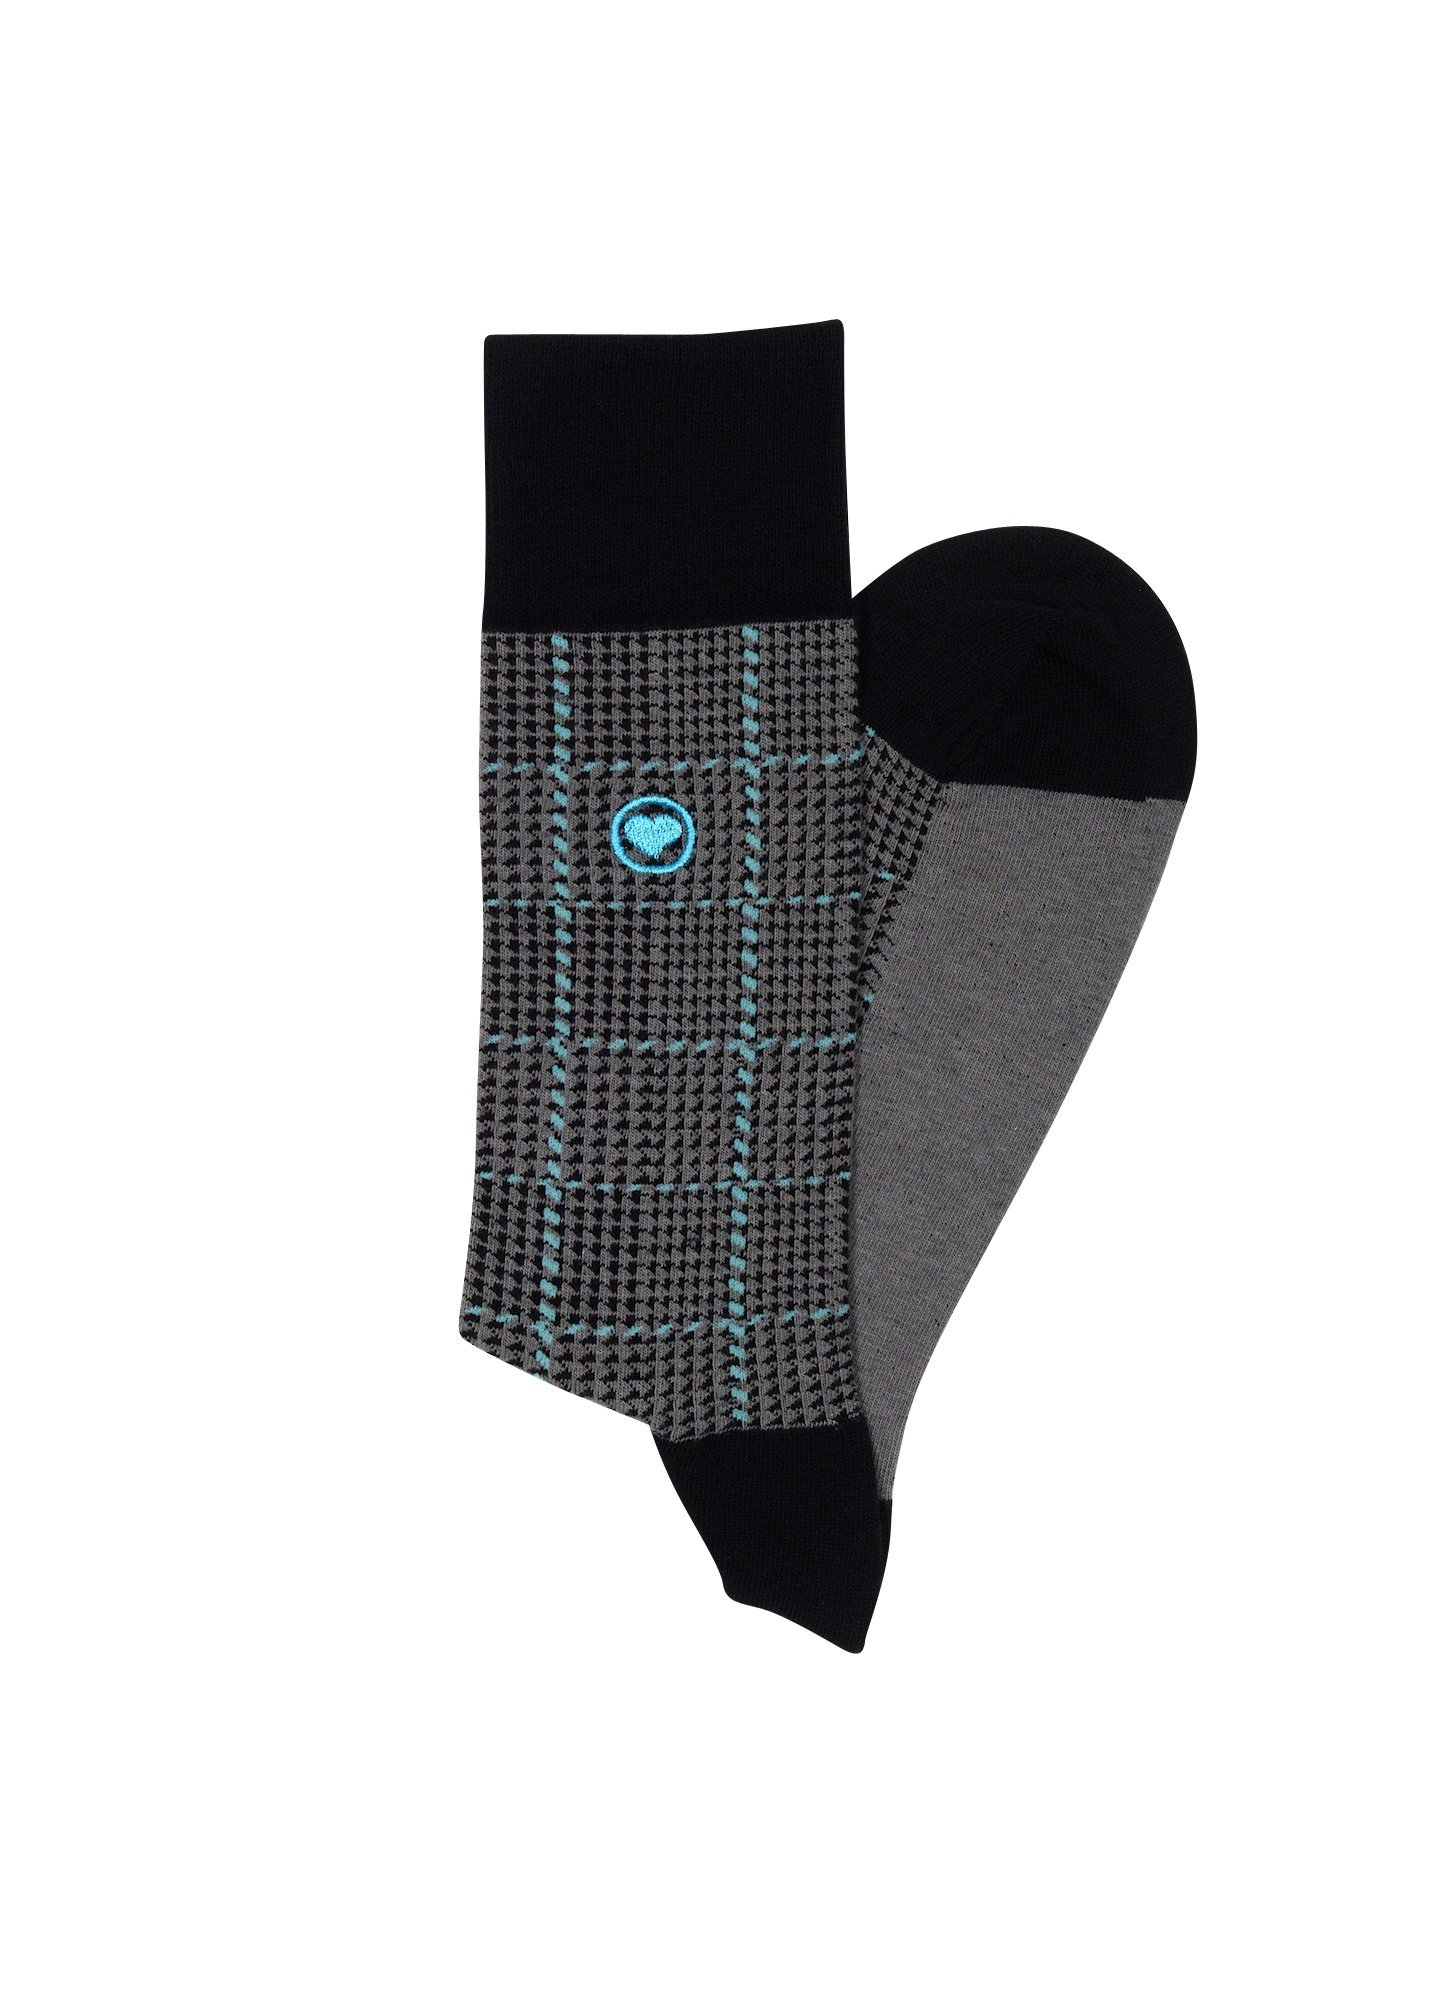 LOVE SOCK COMPANY Black Organic cotton men's dress socks bundle. 3 Premium black socks solid, polka dots and houndstooth patterned socks set by LOVE SOCK COMPANY (Image #2)